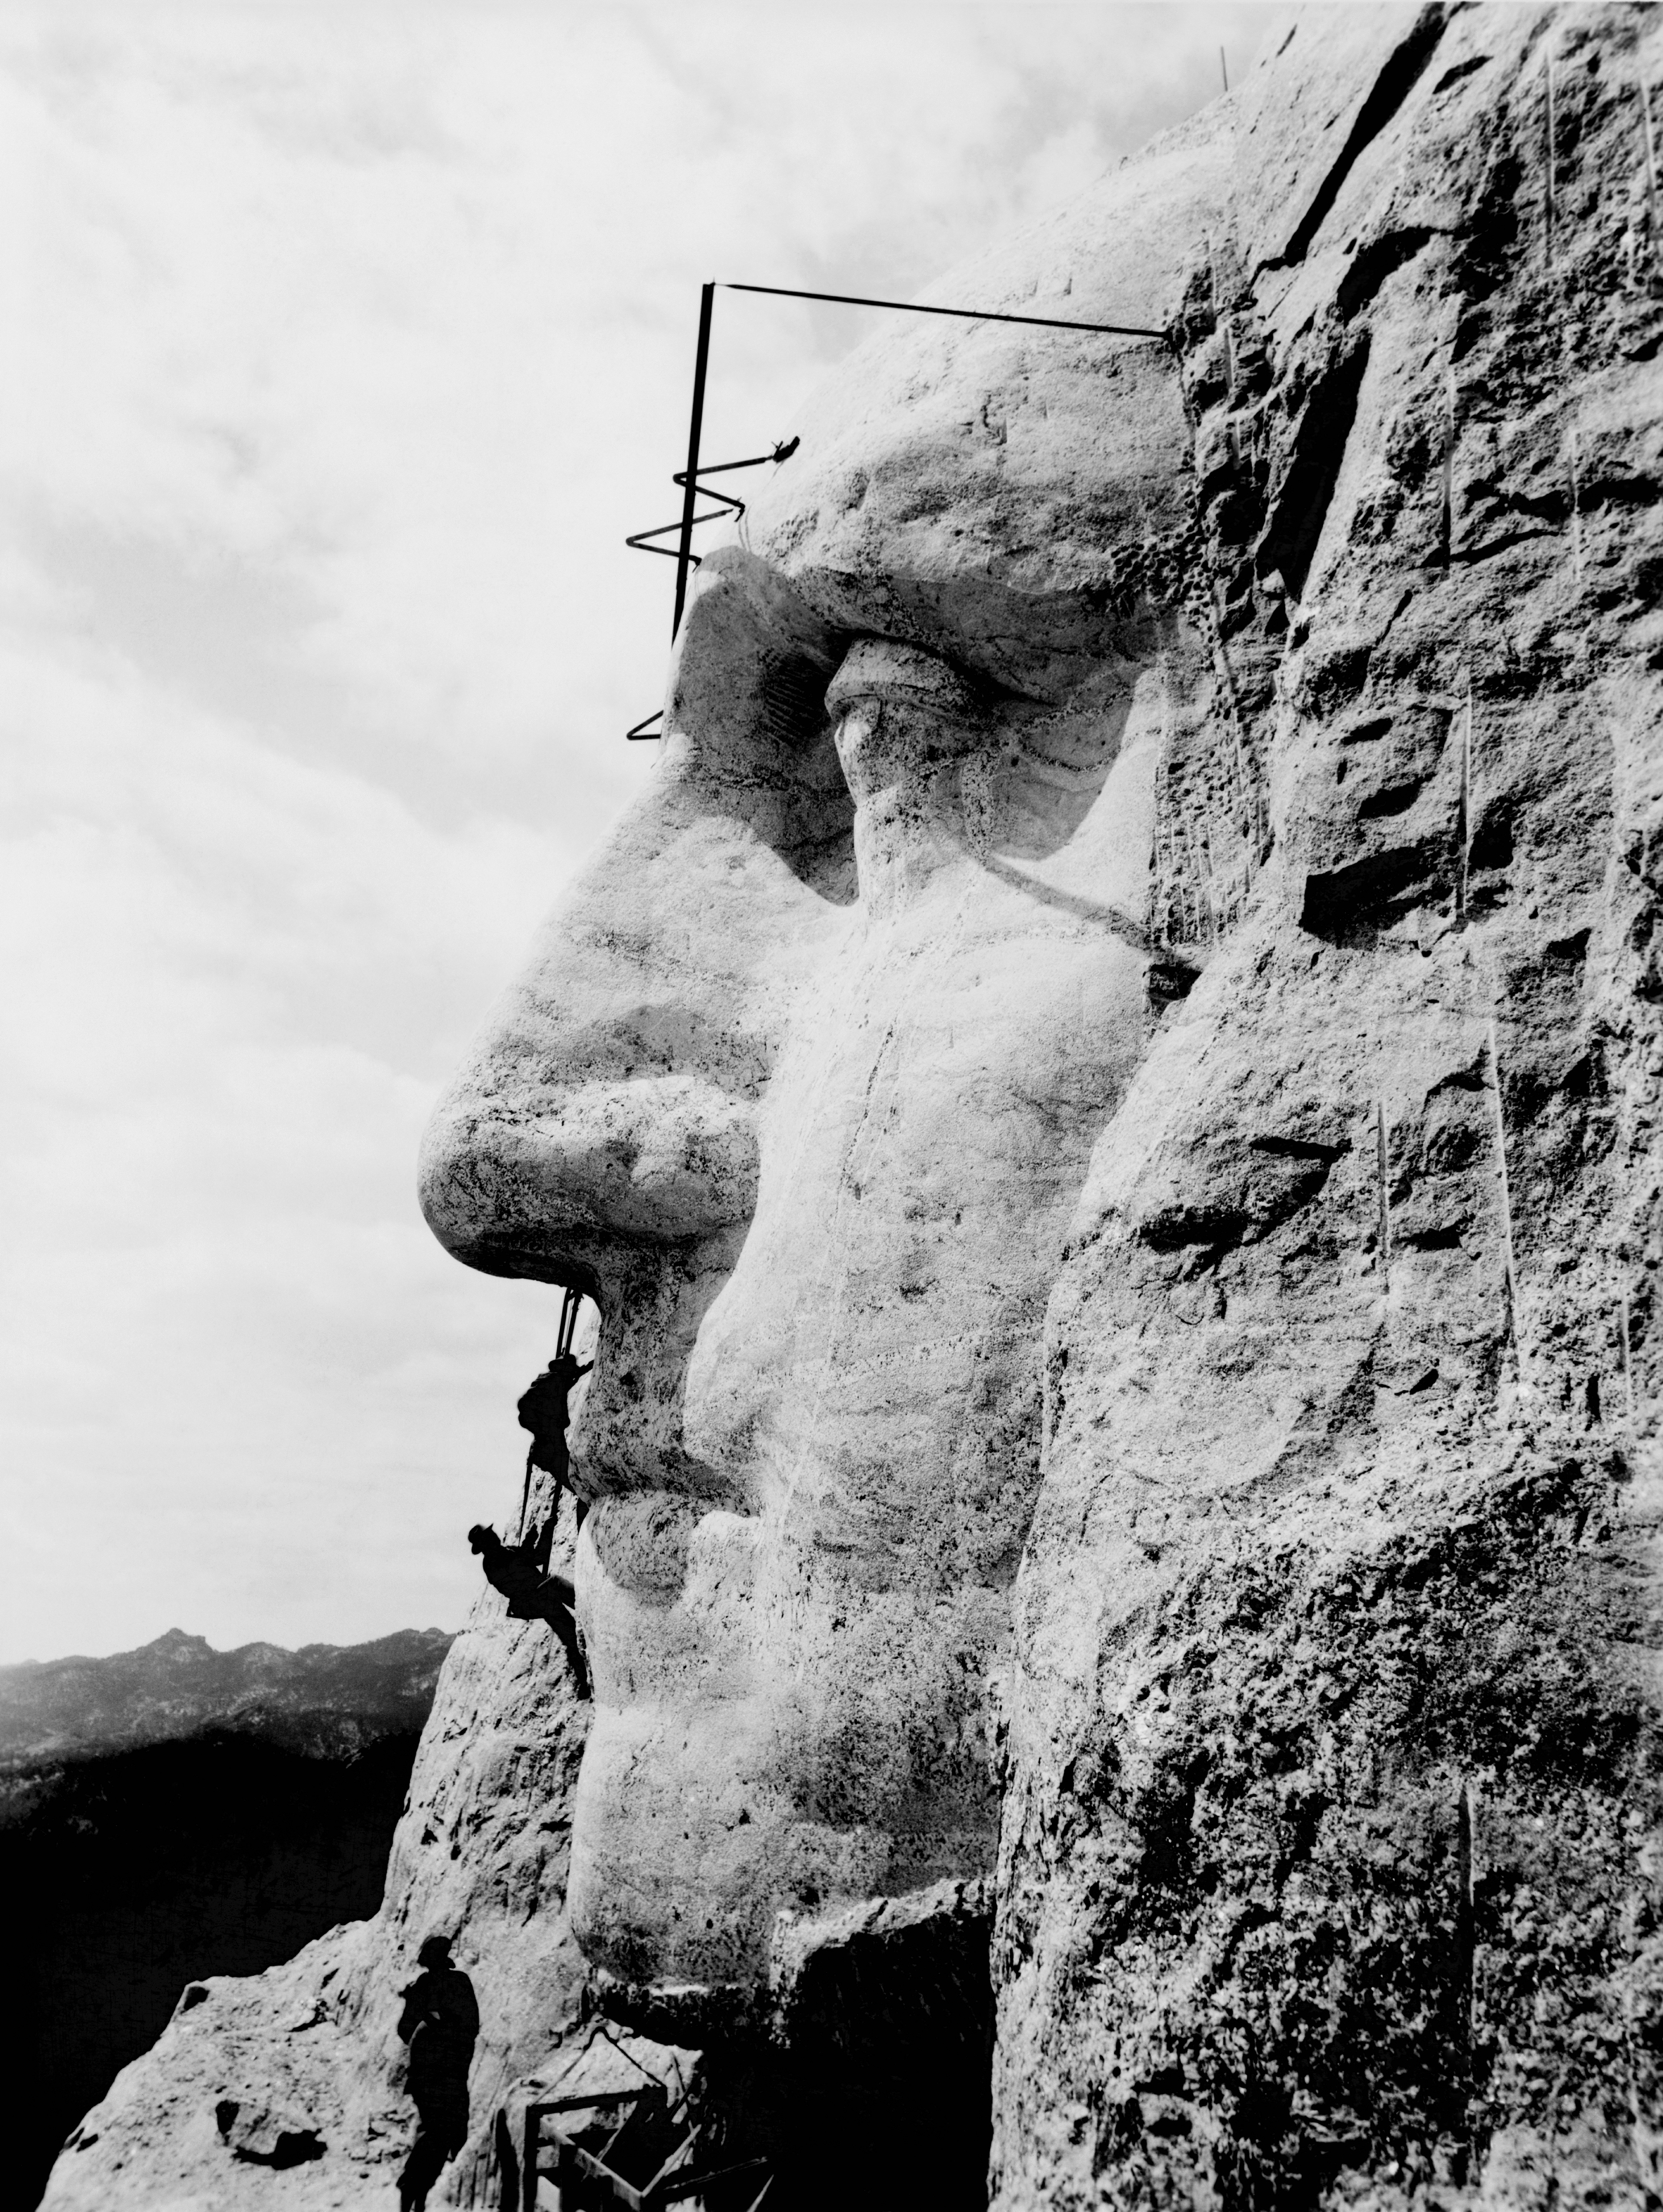 George Washington's likeness under construction on Mount Rushmore